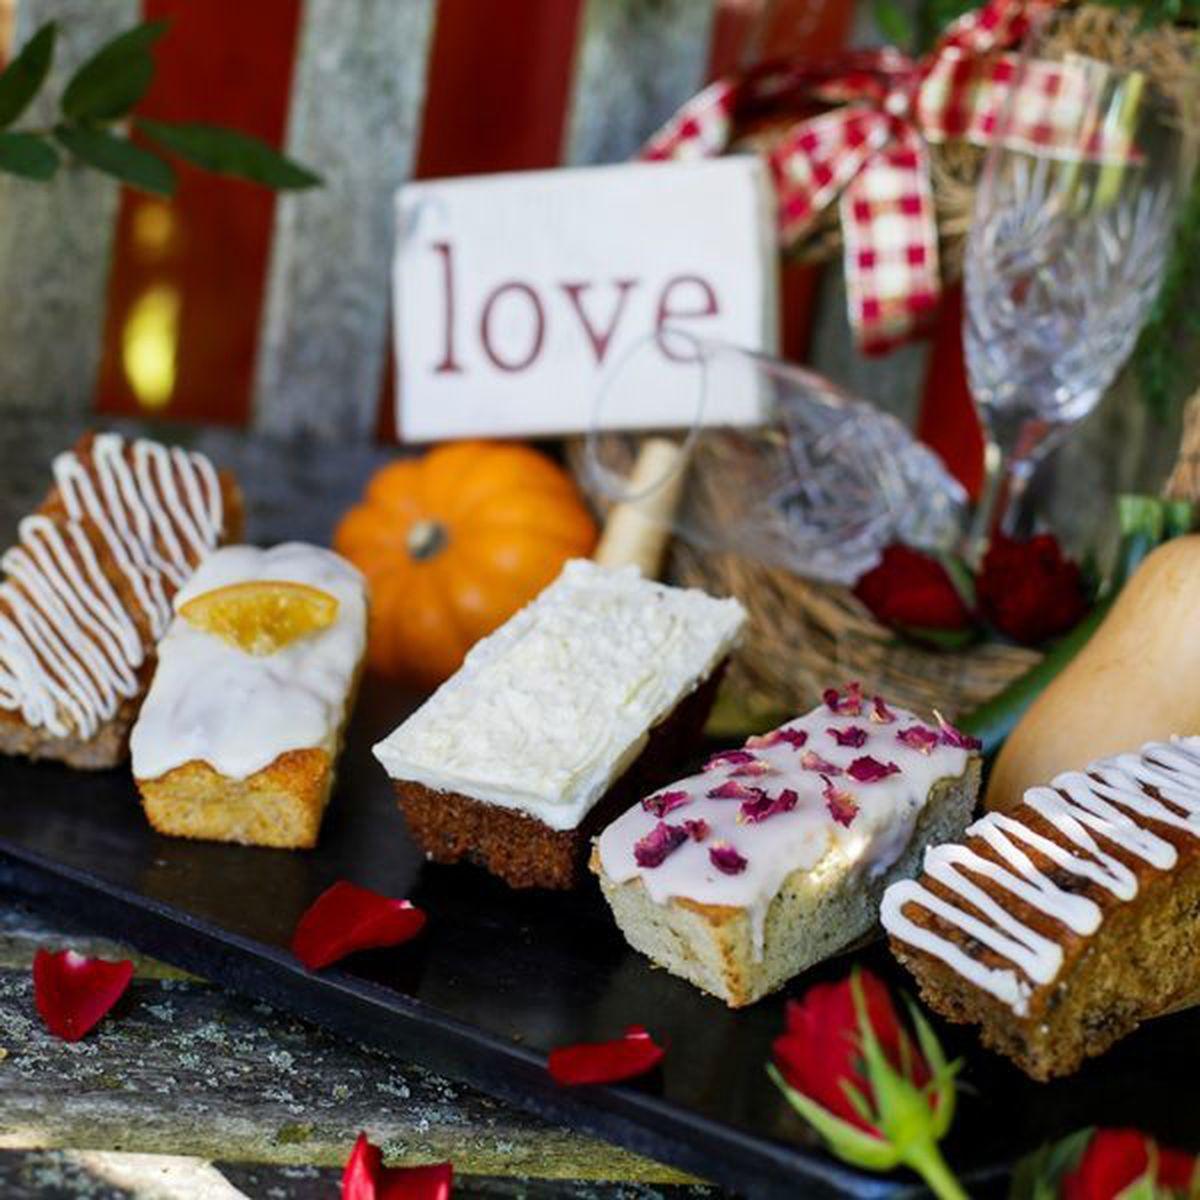 Romantic Valentines Cake Selection